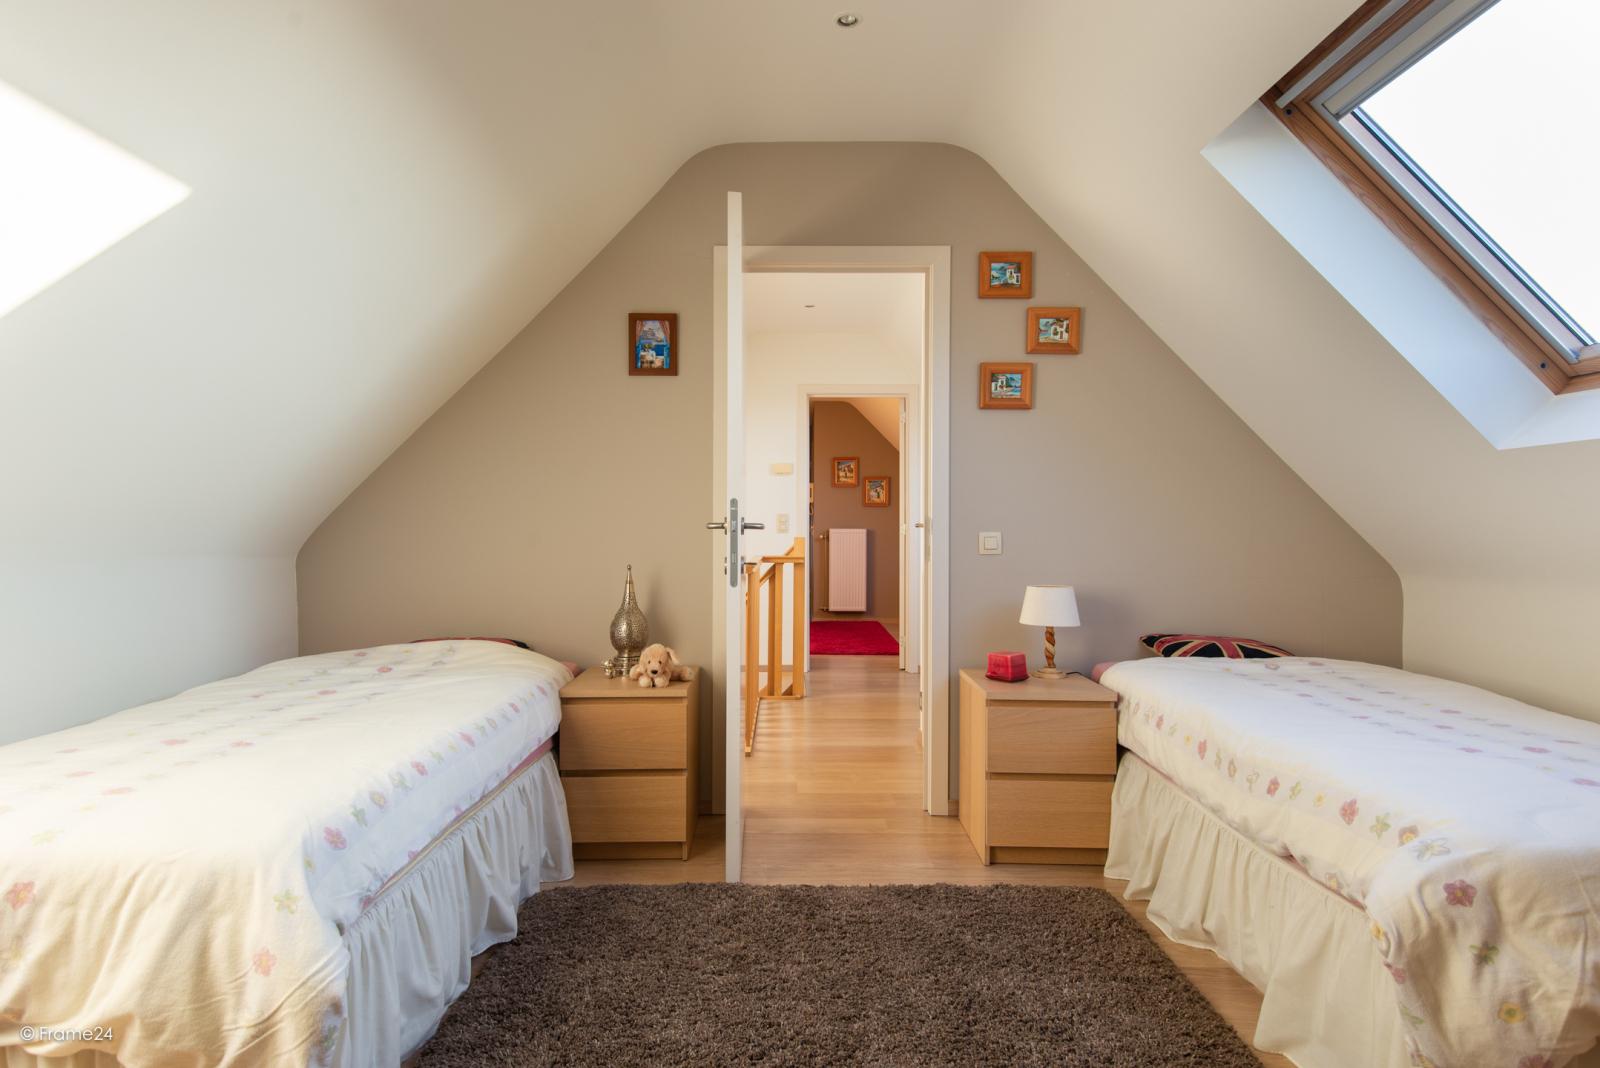 Riant dakappartement (130 m²) met zonnig terras in residentie 'Eyserhof' te Wijnegem! afbeelding 18